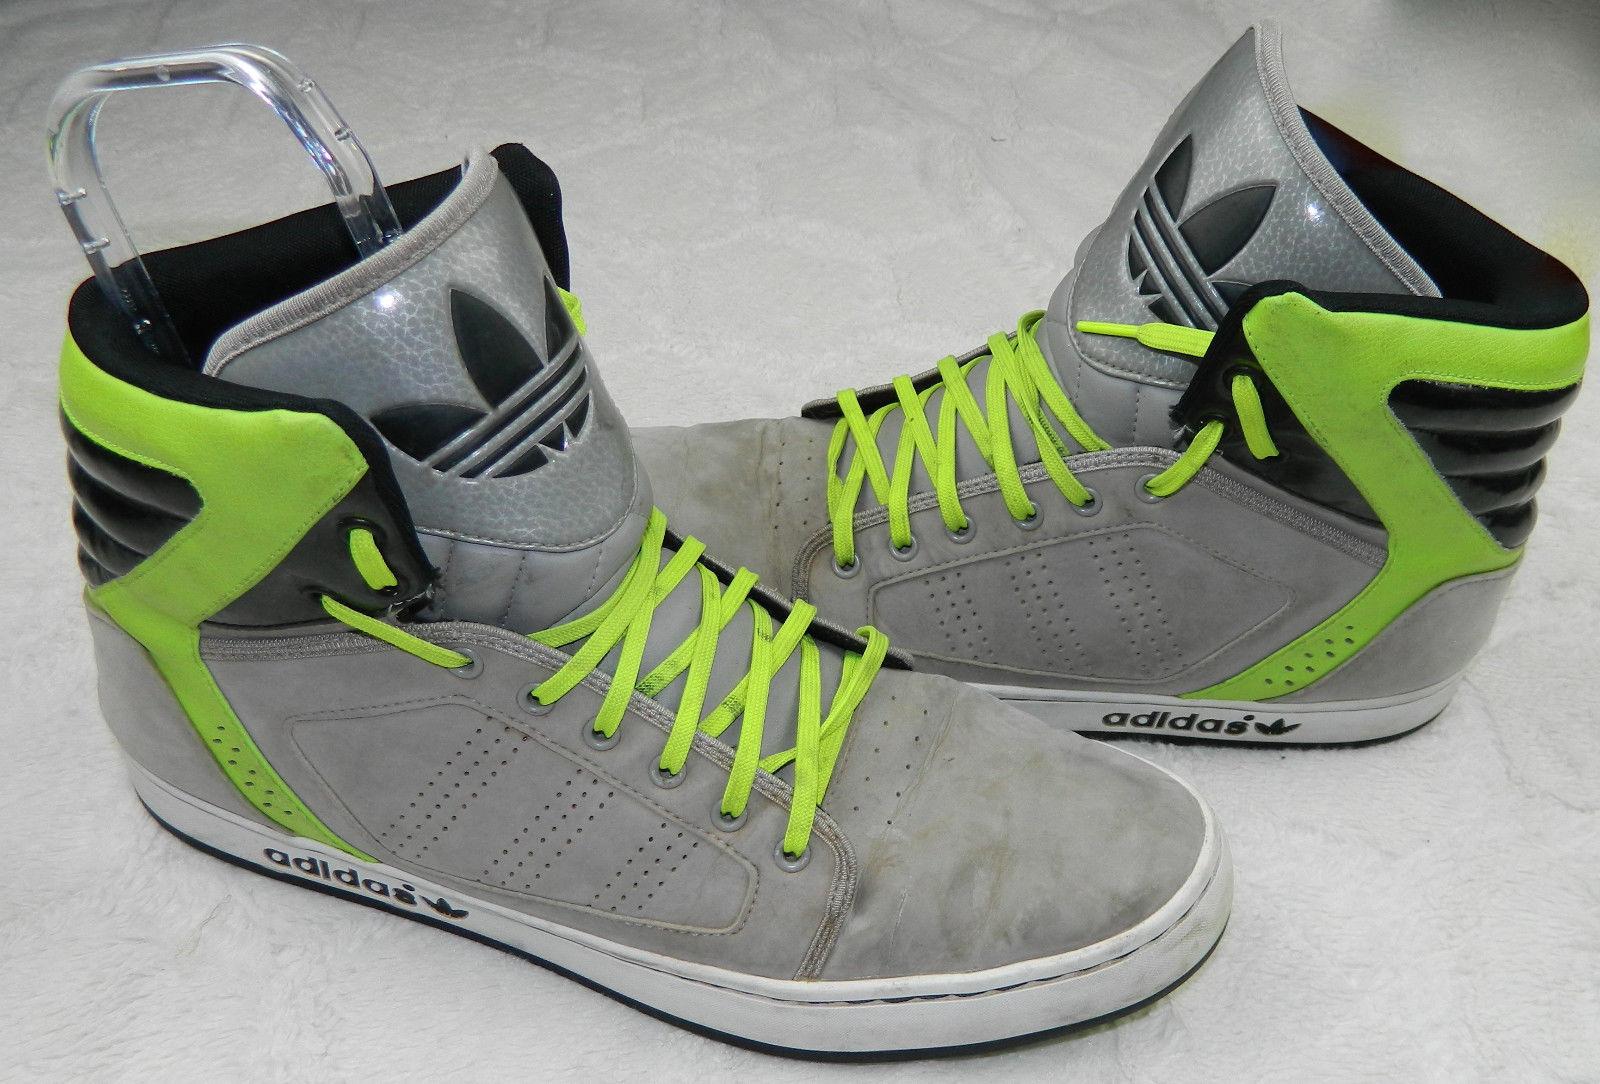 Adidas Torison Hi Tops Taglia 13 NUOVO